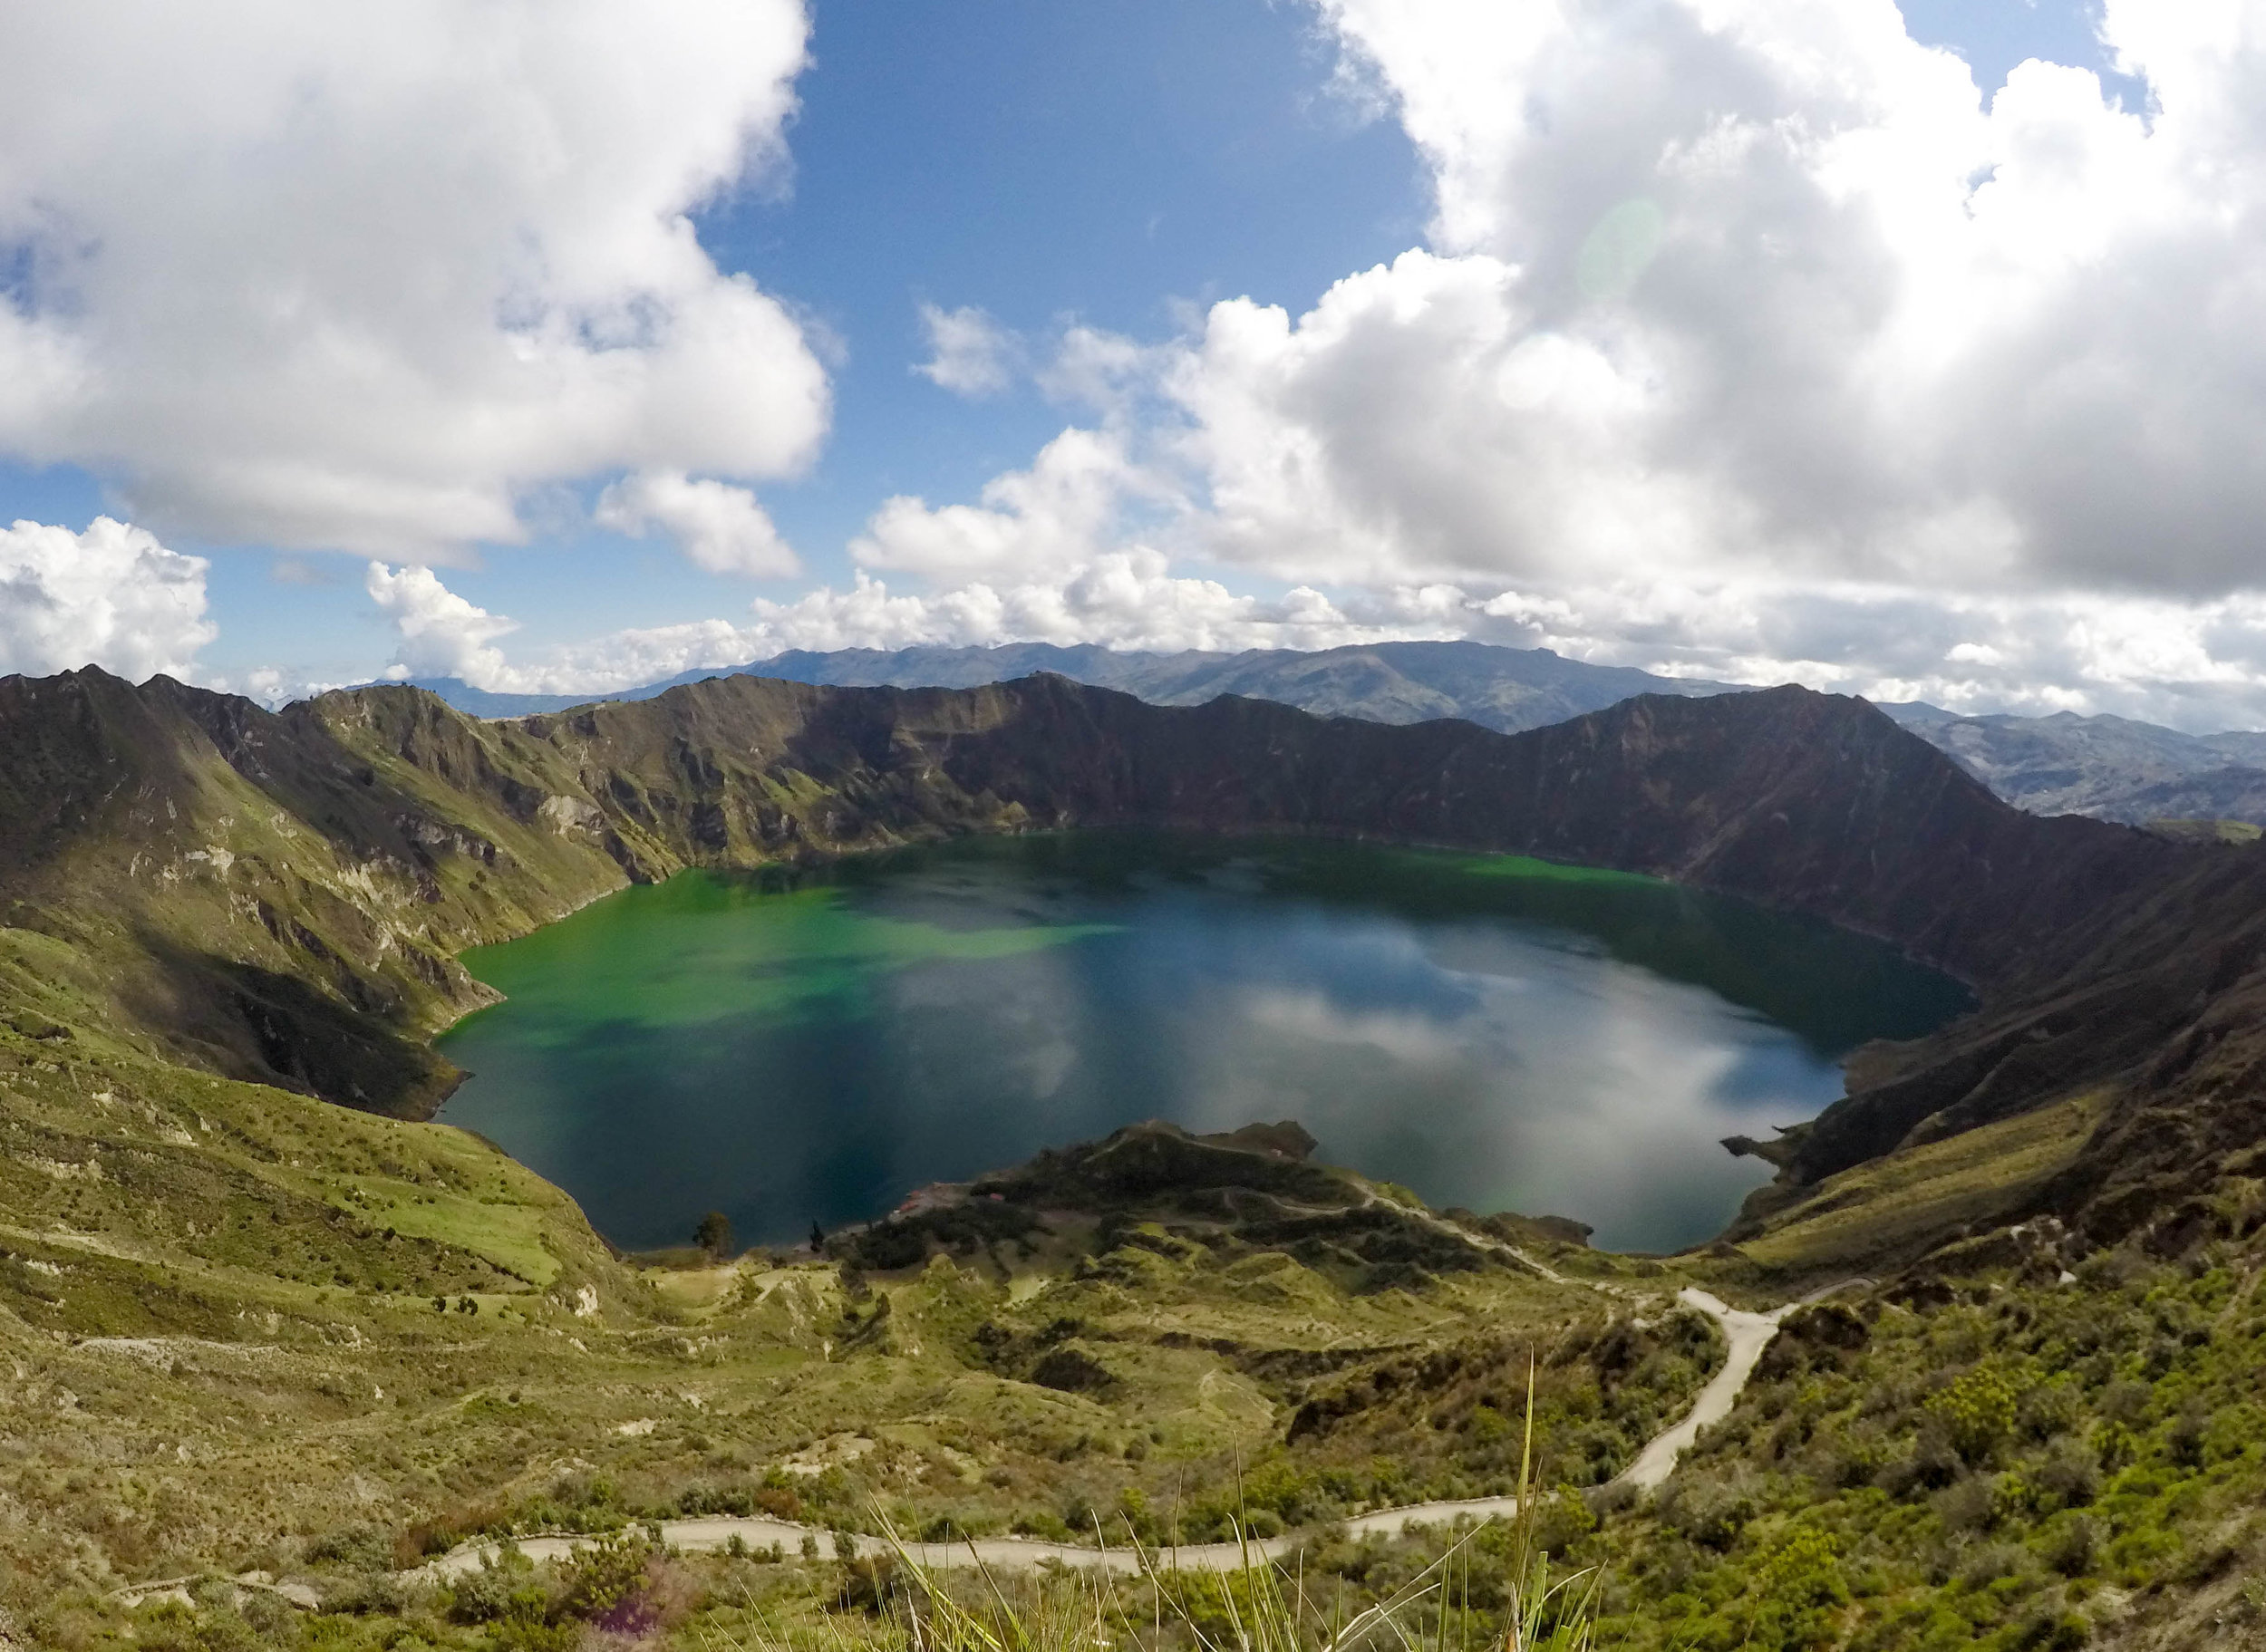 The Crater Lake of Quilotoa, Ecuador